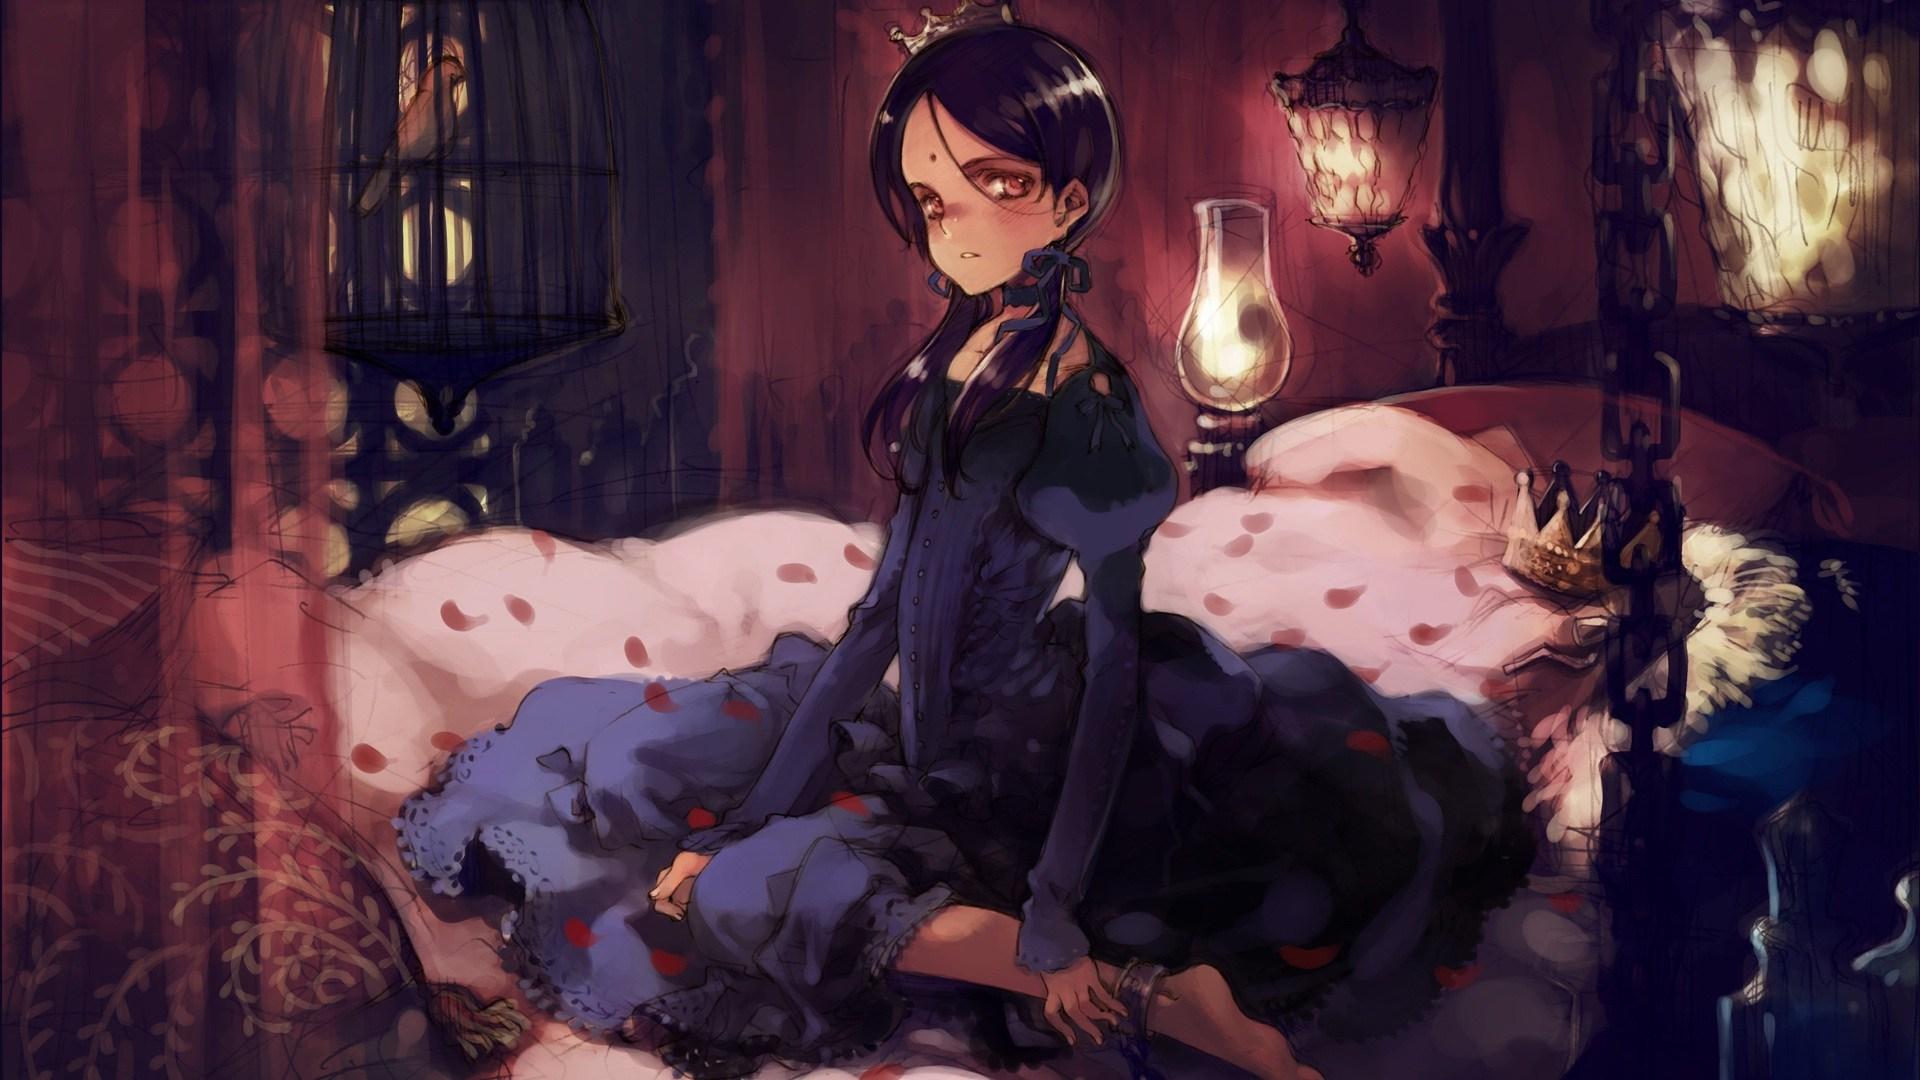 Bleach Girls Wallpaper Free Download Gothic Anime Backgrounds Pixelstalk Net